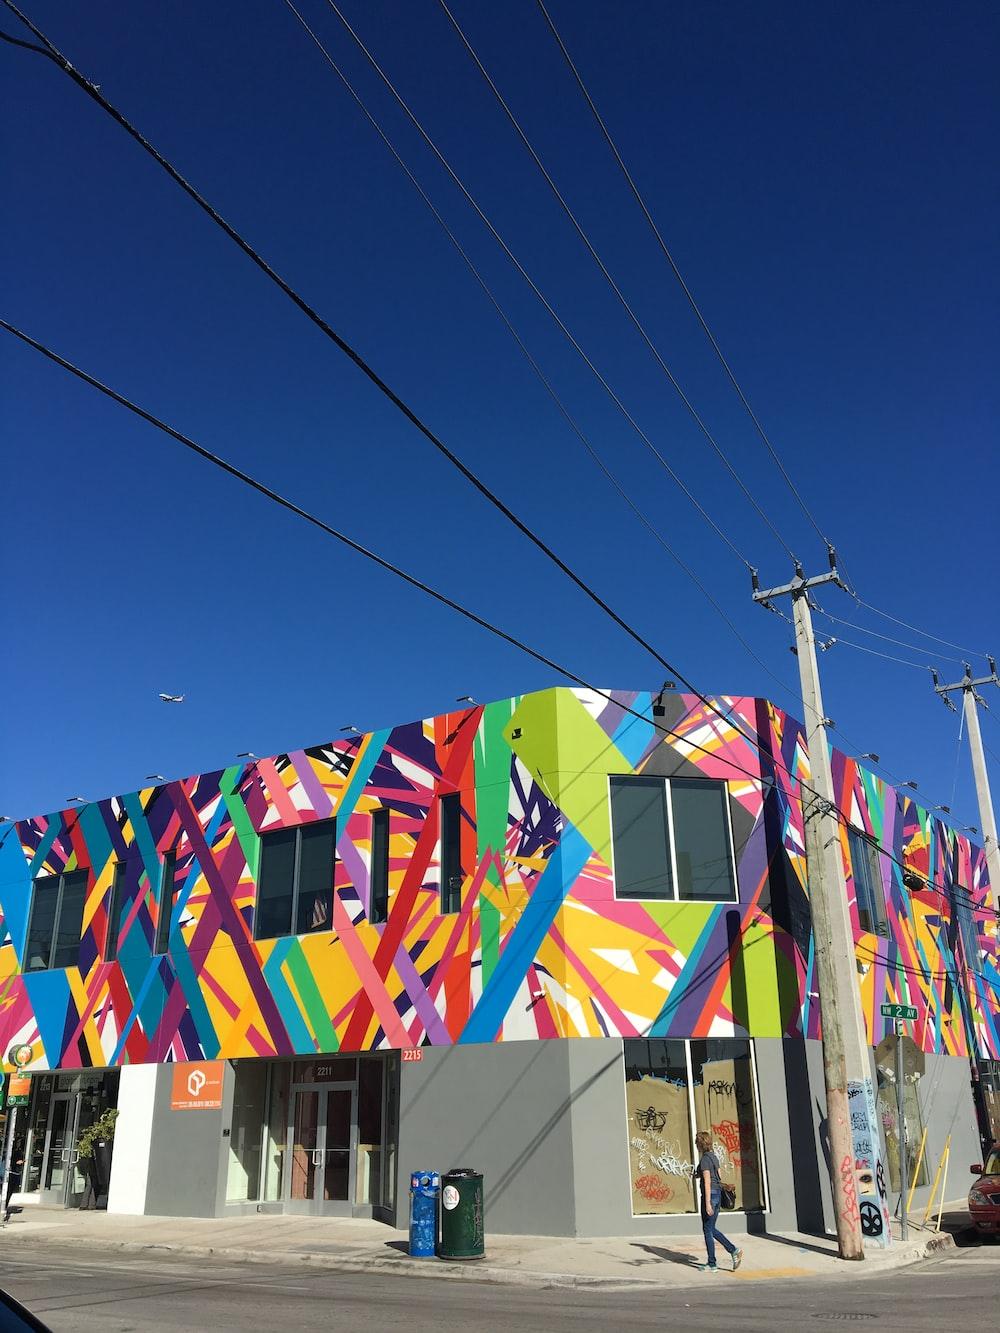 multicolored concrete building near power lines